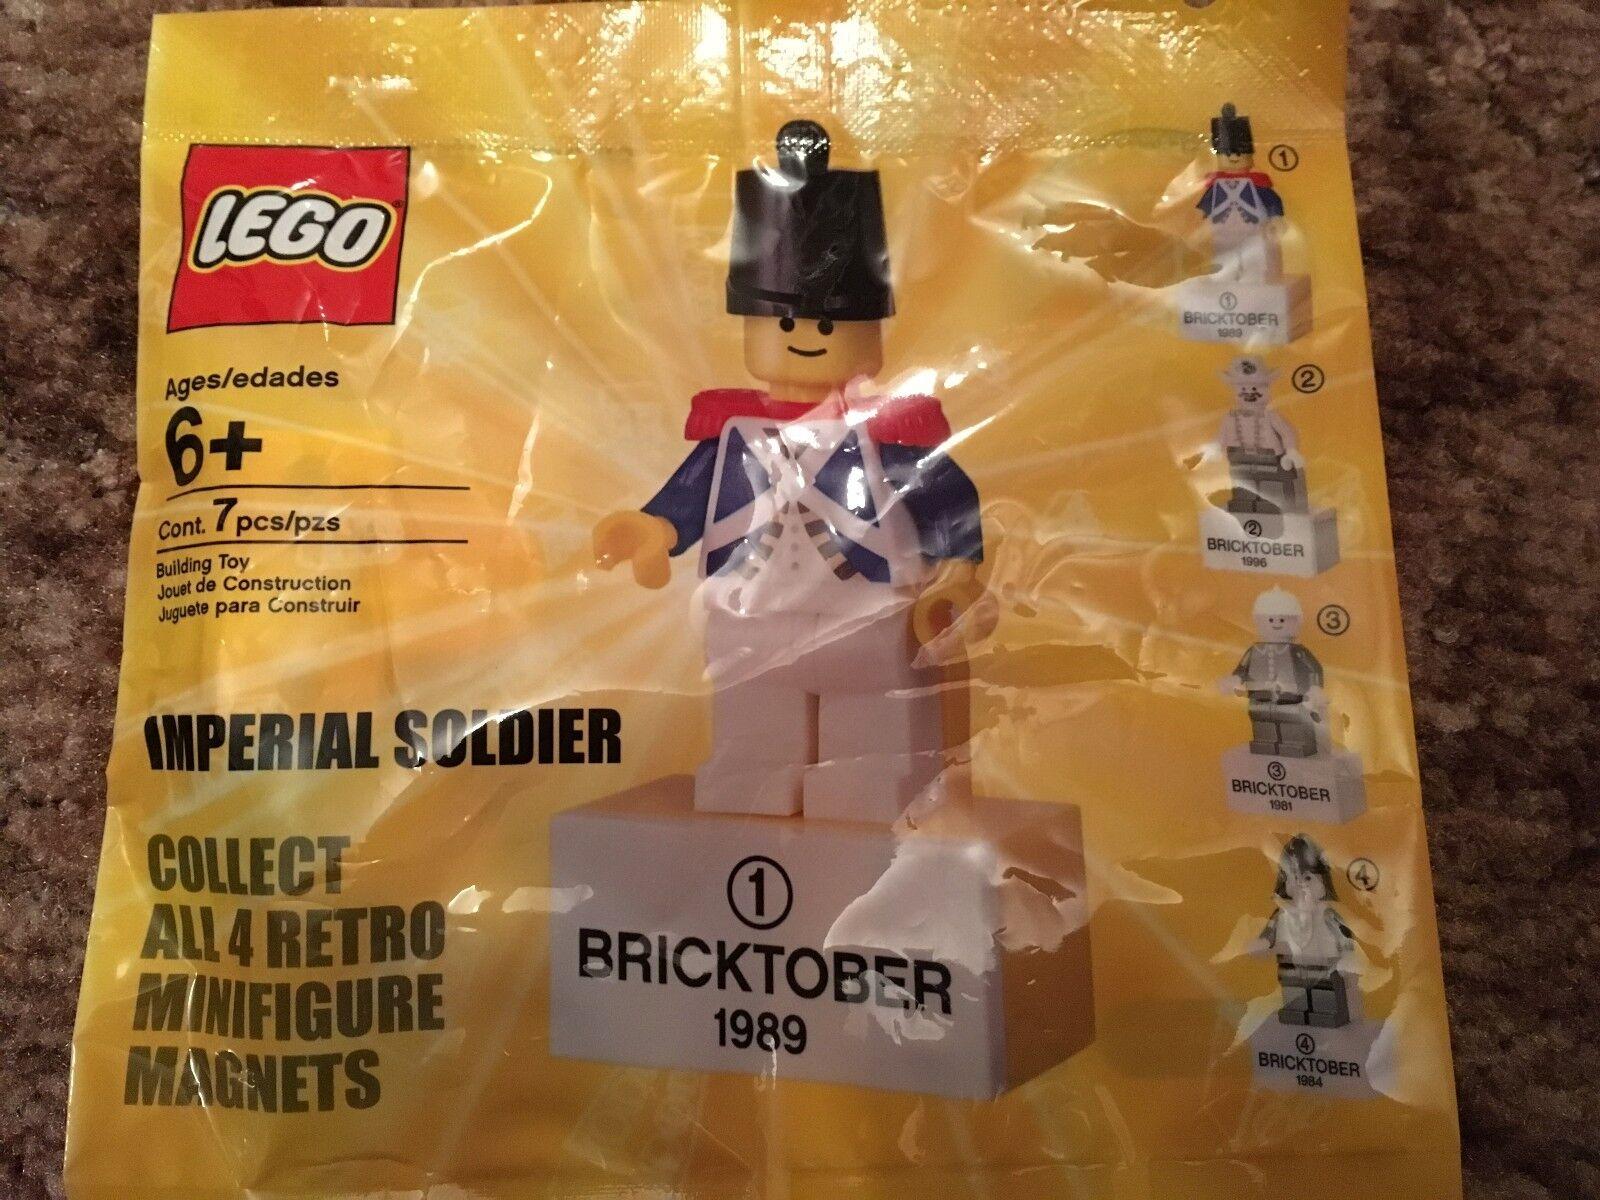 Lego Rétro bricktober AiFemmet Set Of 4 Brand Brand Brand New & Sealed   Choix Des Matériaux  ca1e60